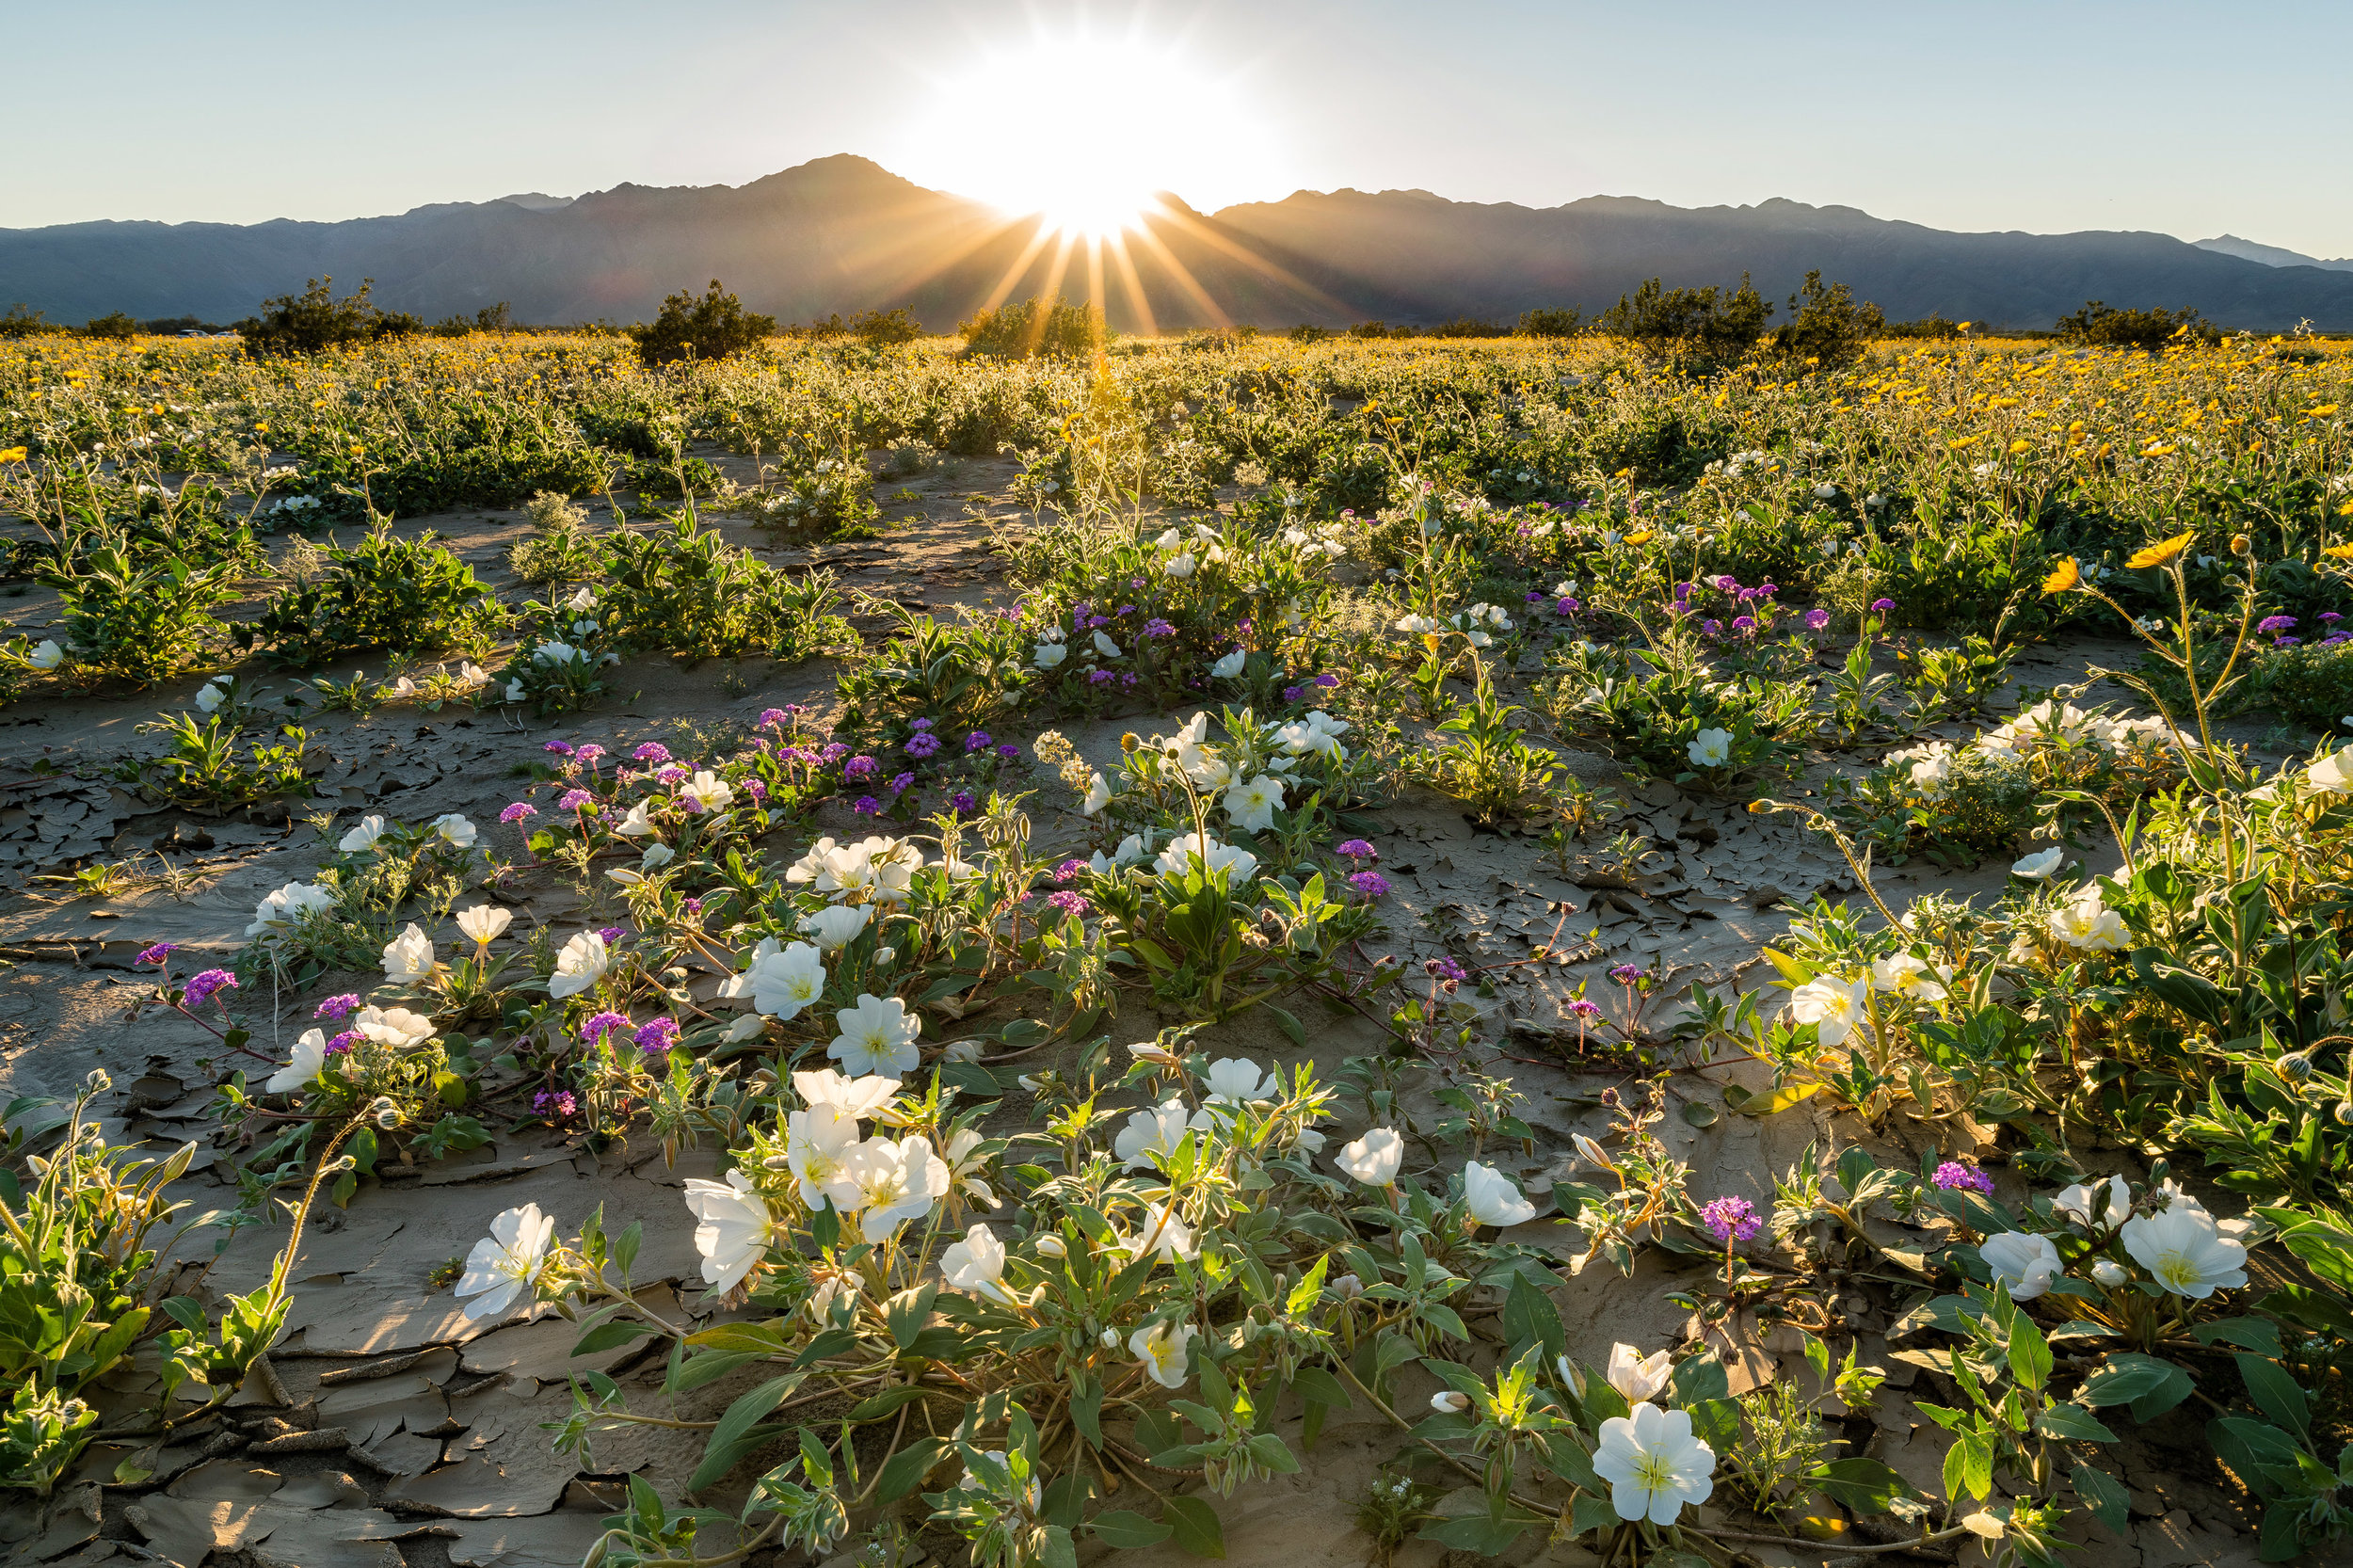 Landscape: Wildflowers in spring bloom, Anza-Borrego Desert State Park, California